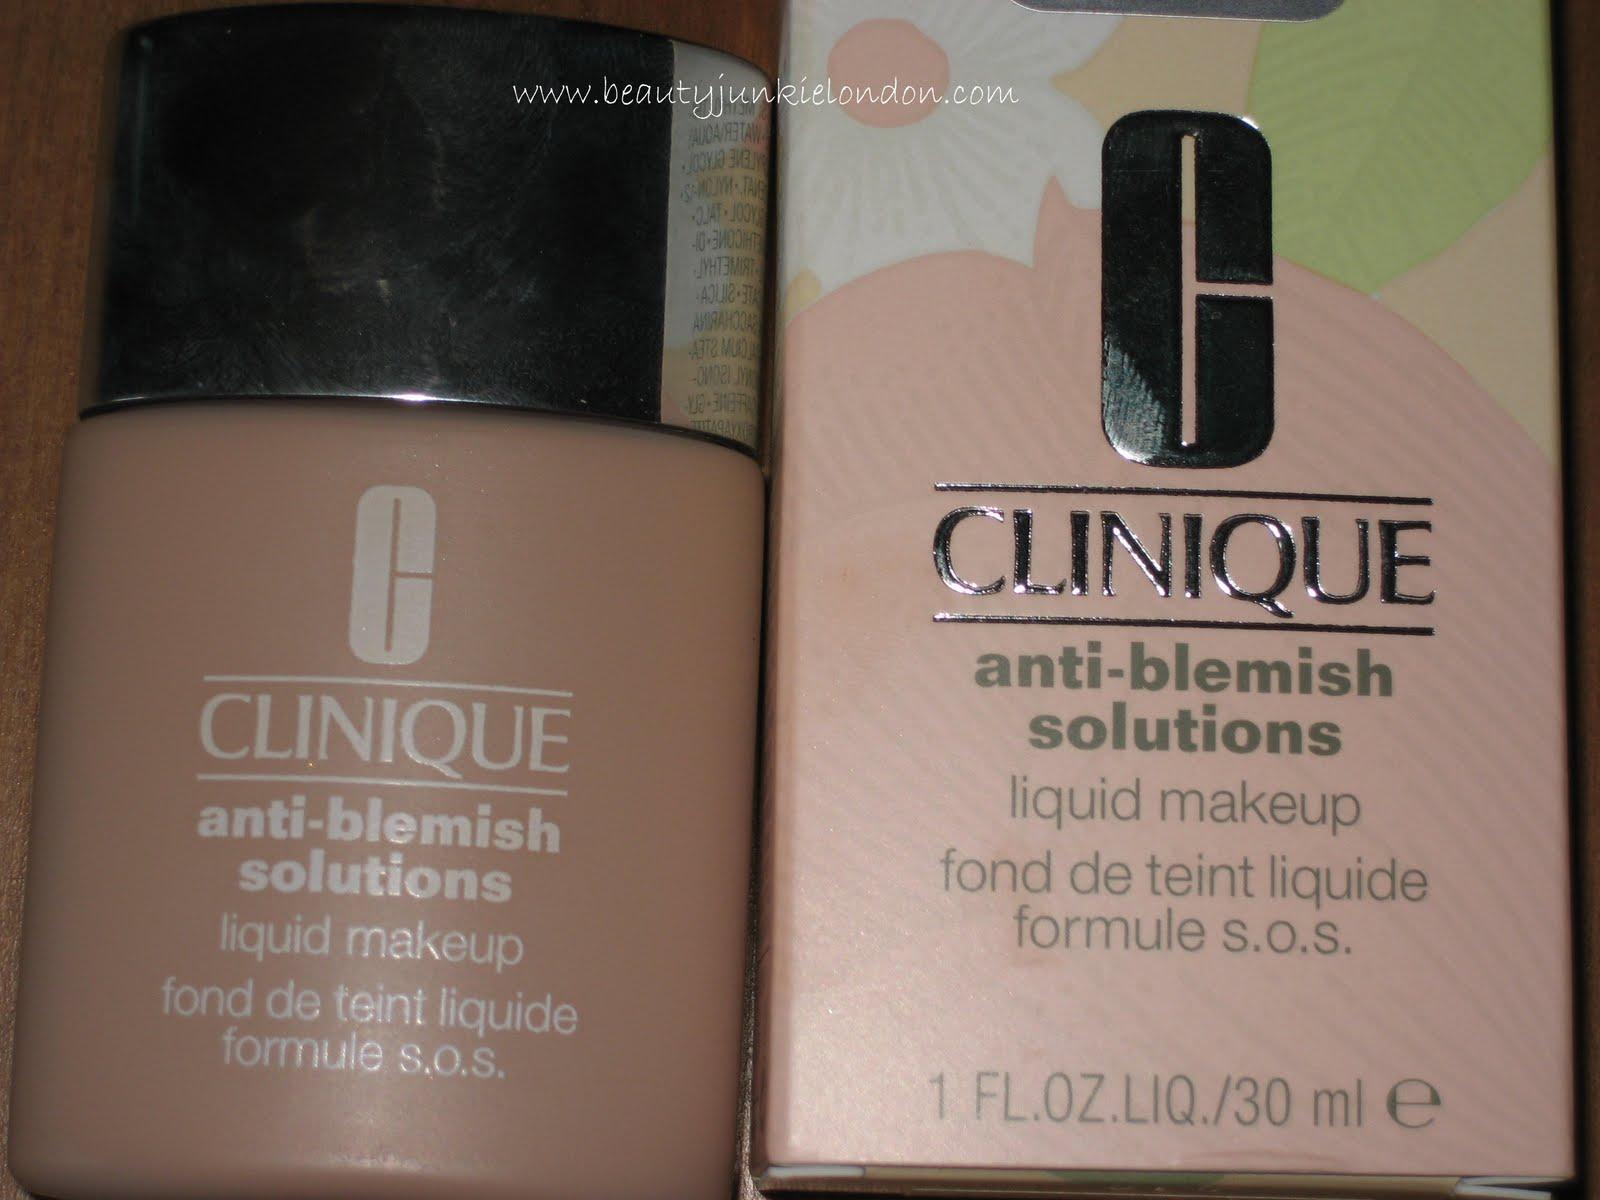 Clinique Anti Blemish Makeup Mugeek Vidalondon